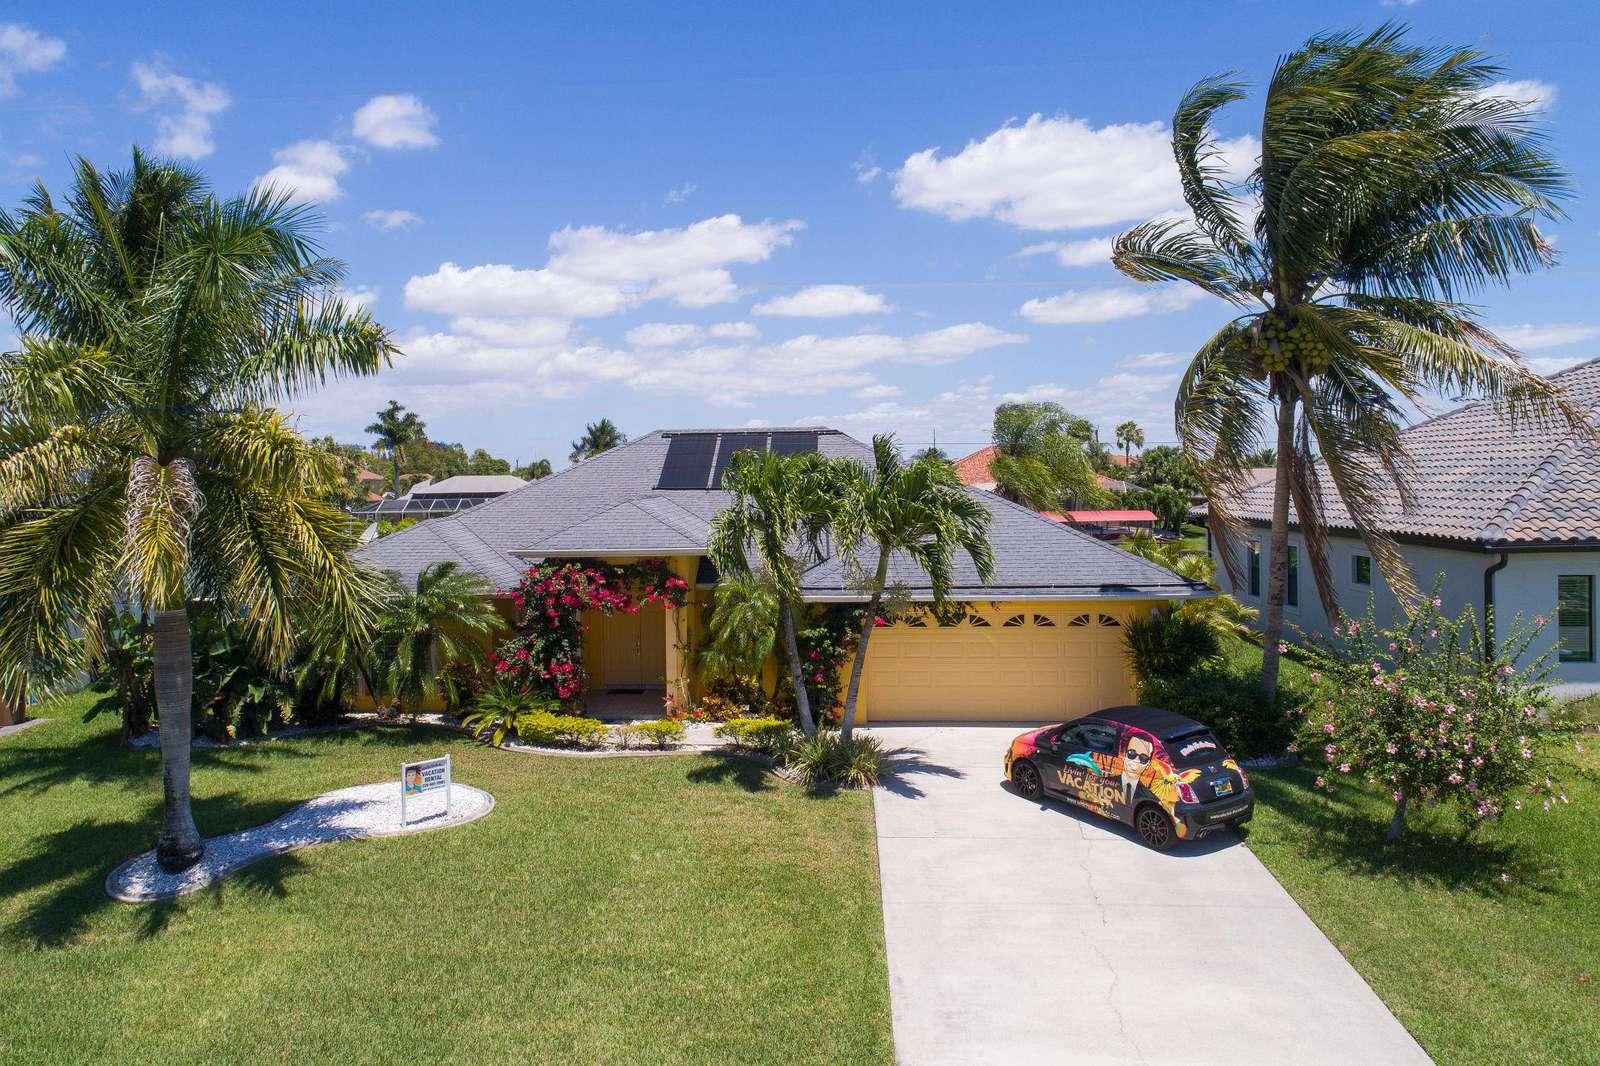 Wischis Florida Home - Pineapple Paradise